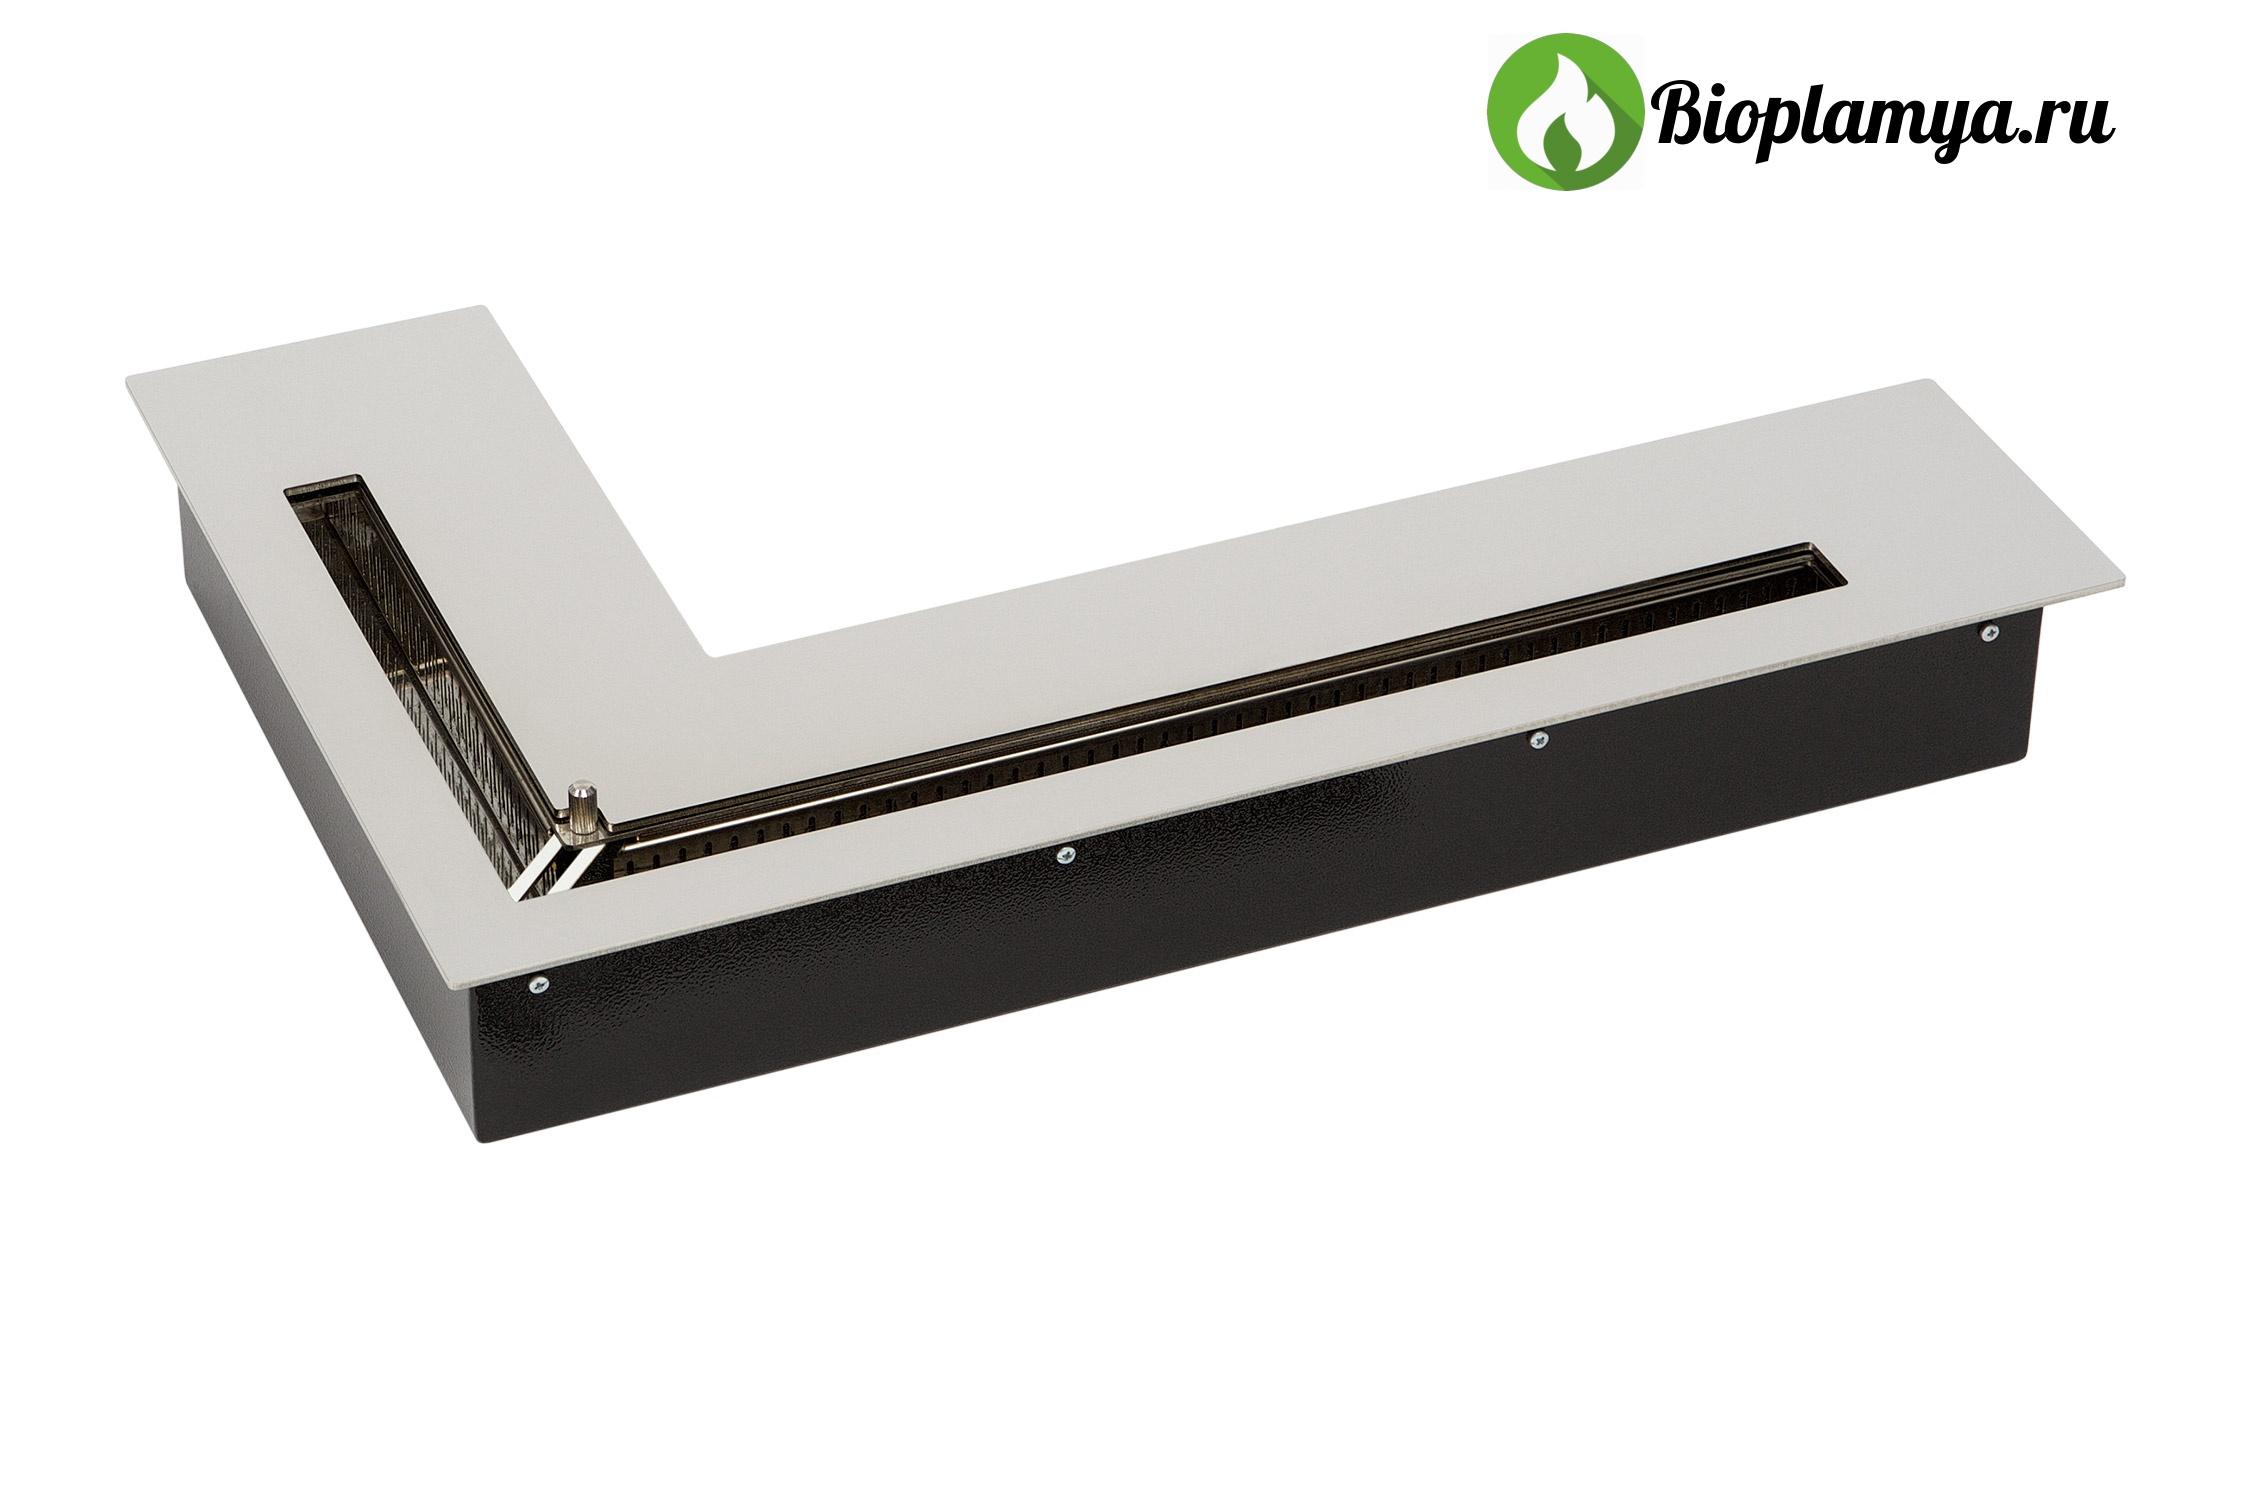 Топливный-блок-биокамина-EXCLUSIVE-L-Silver-Smith-Bioplamya.jpg